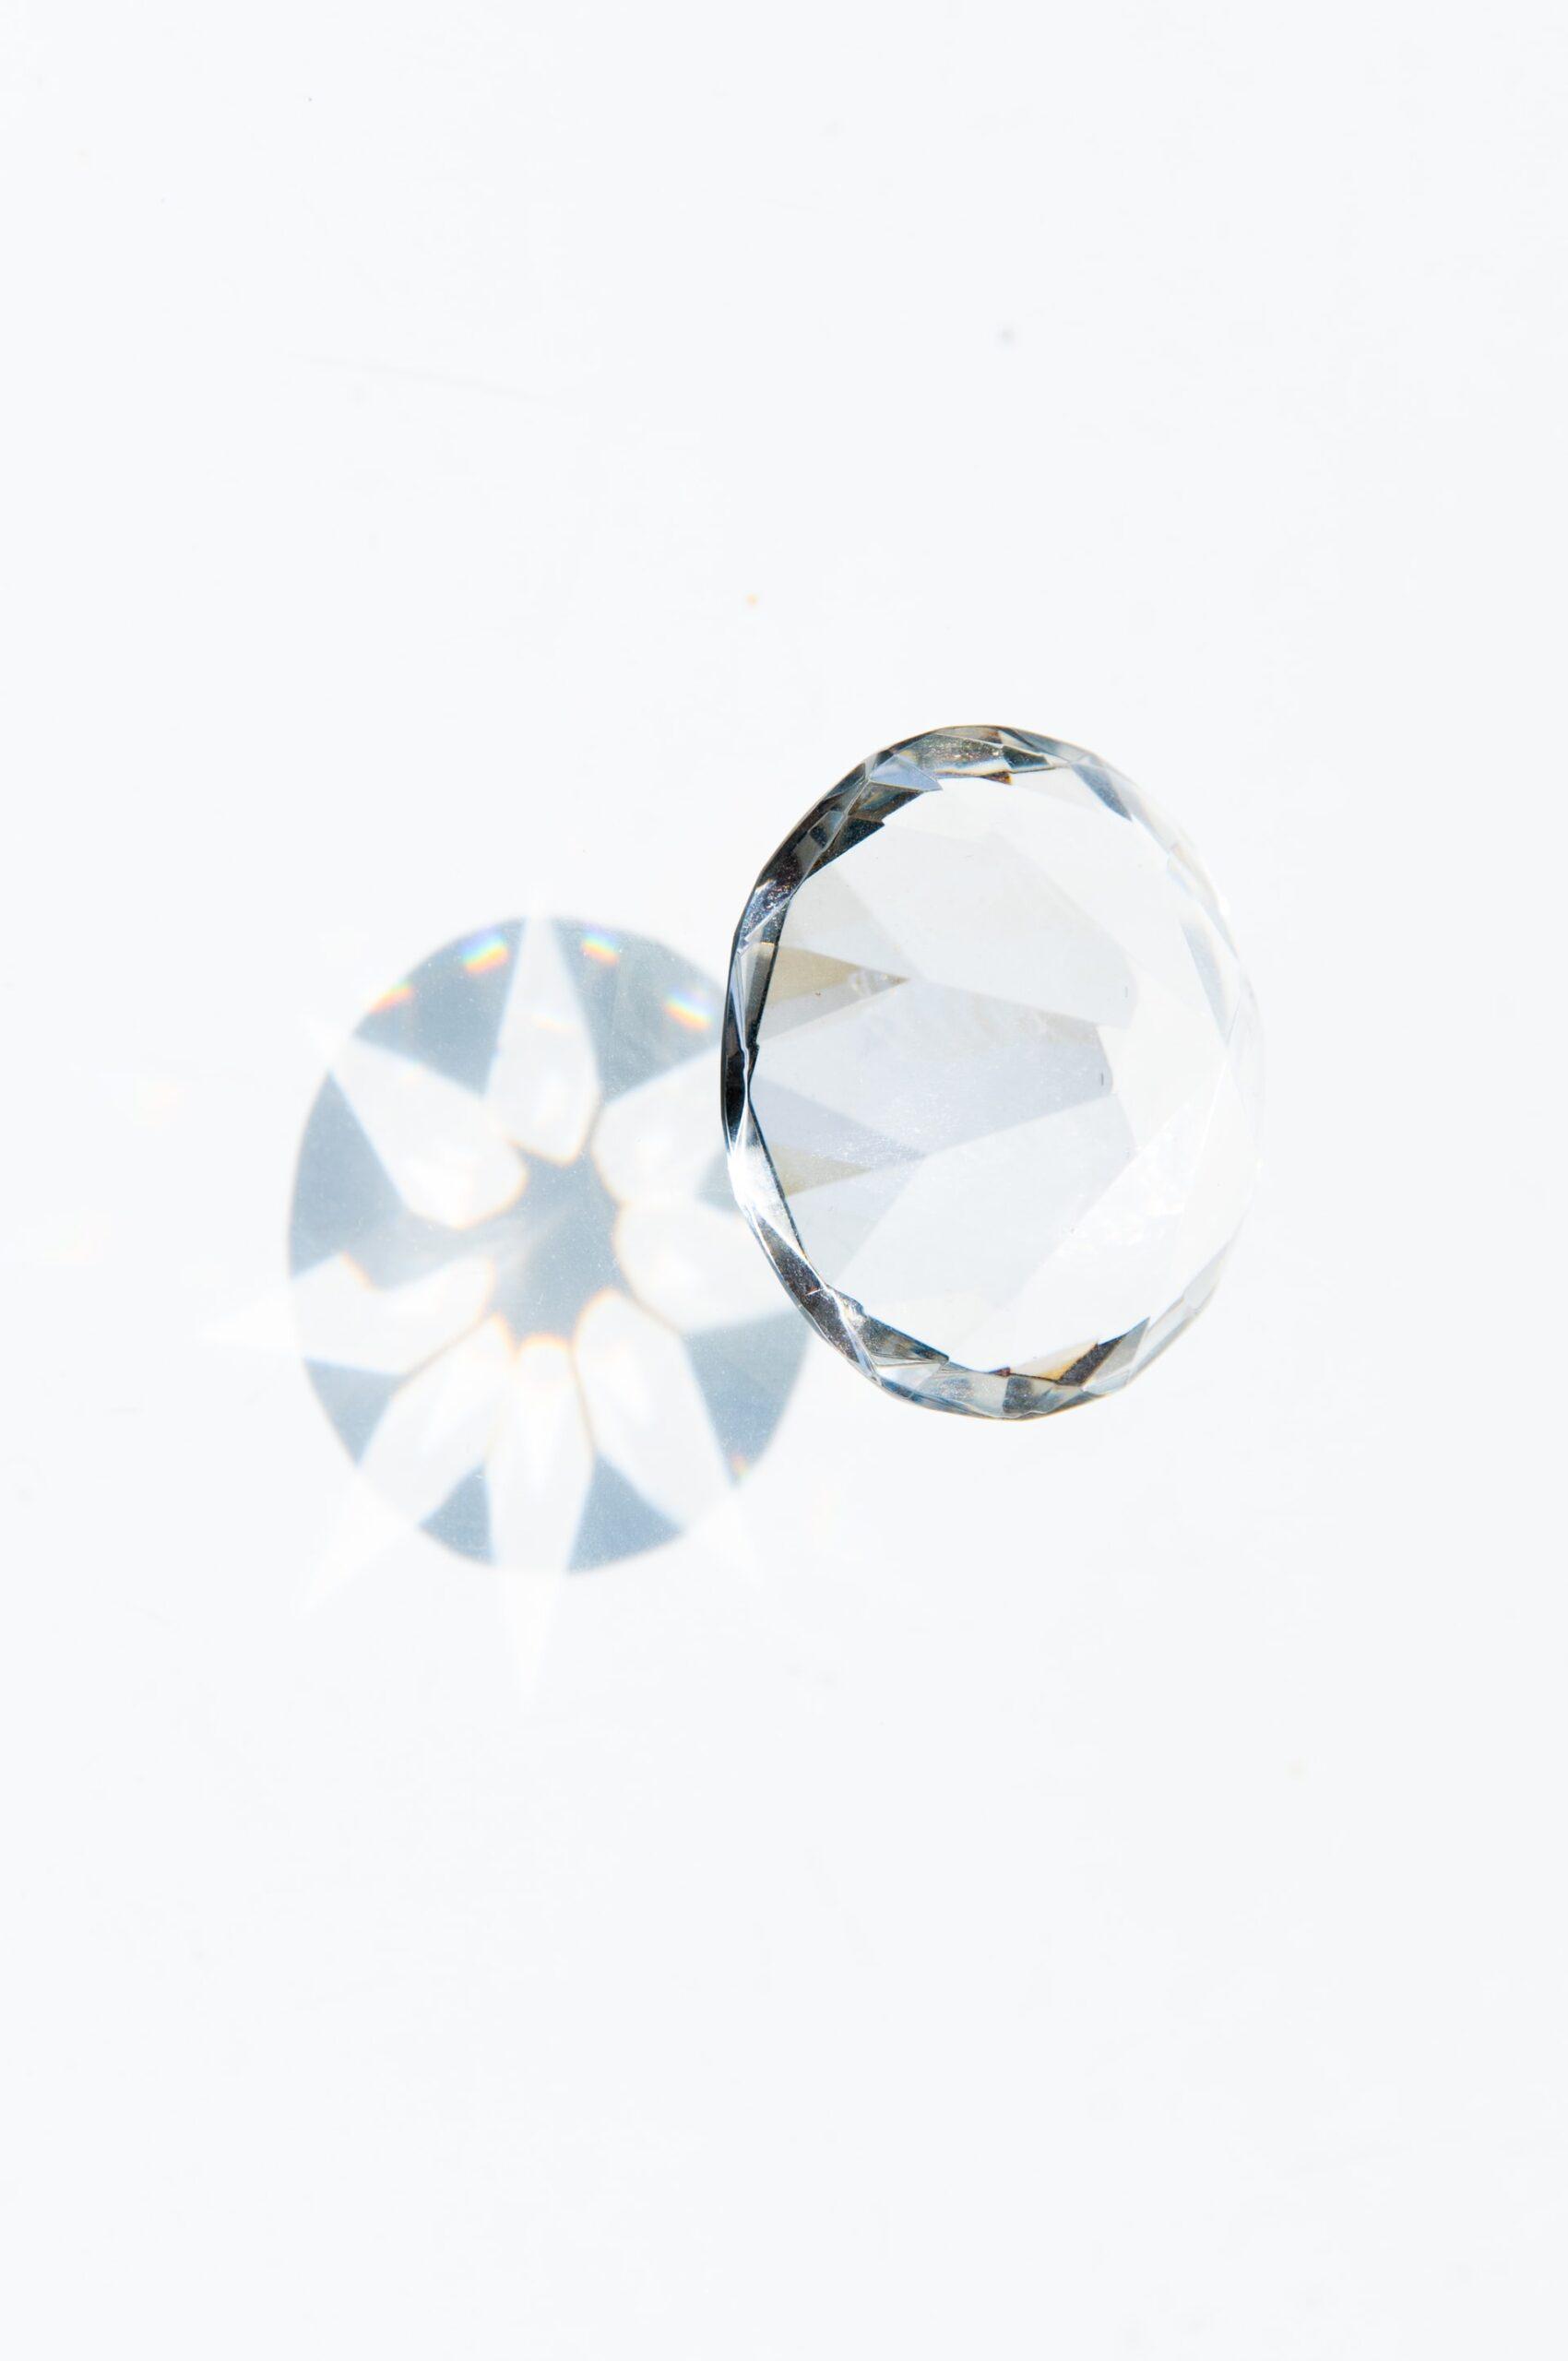 Diamond quality selection criteria